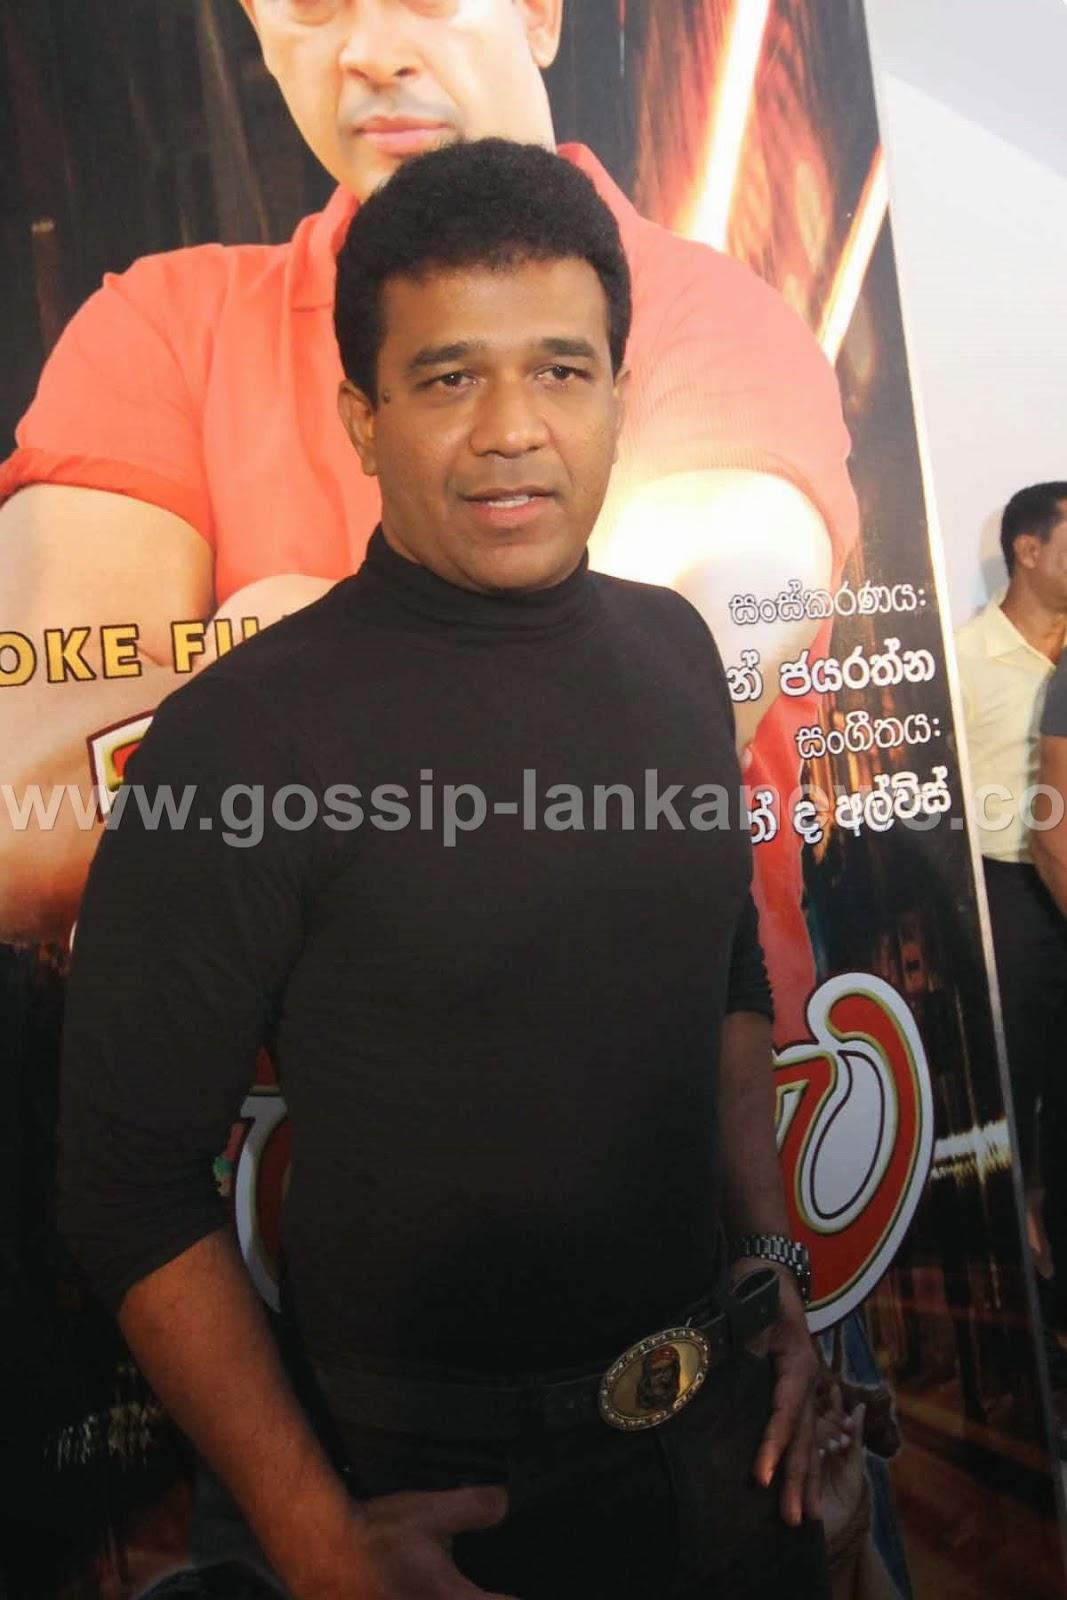 raja horu film release gossip   lanka news photo